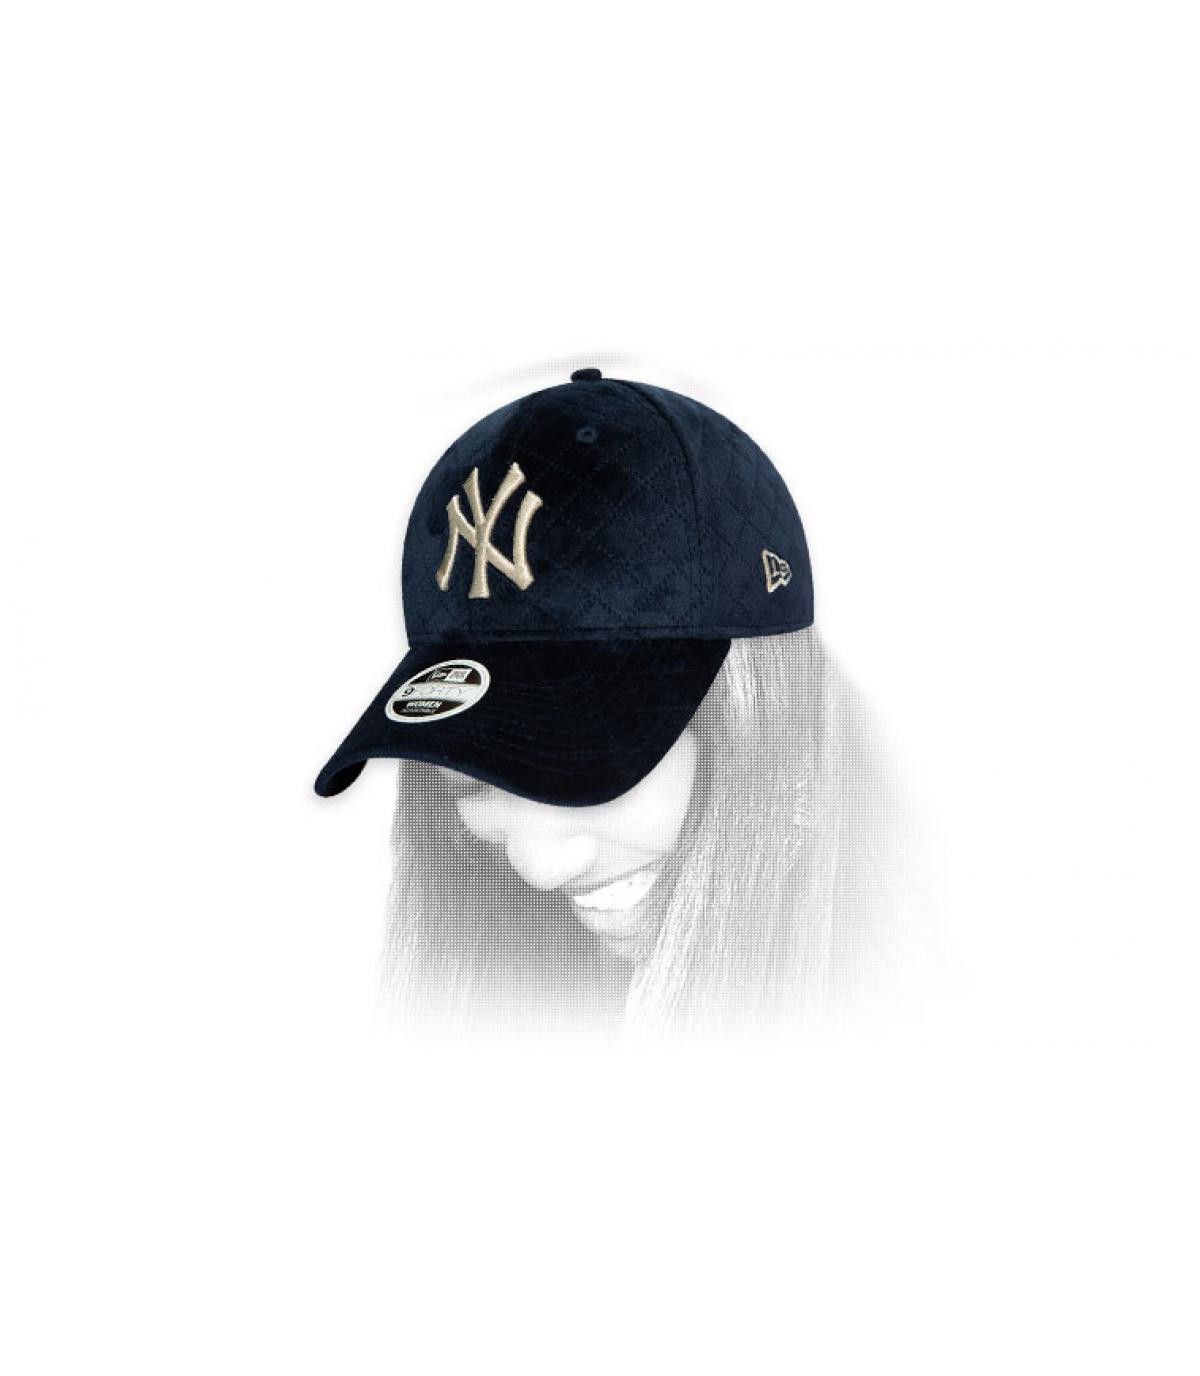 cap vrouw NY blauw